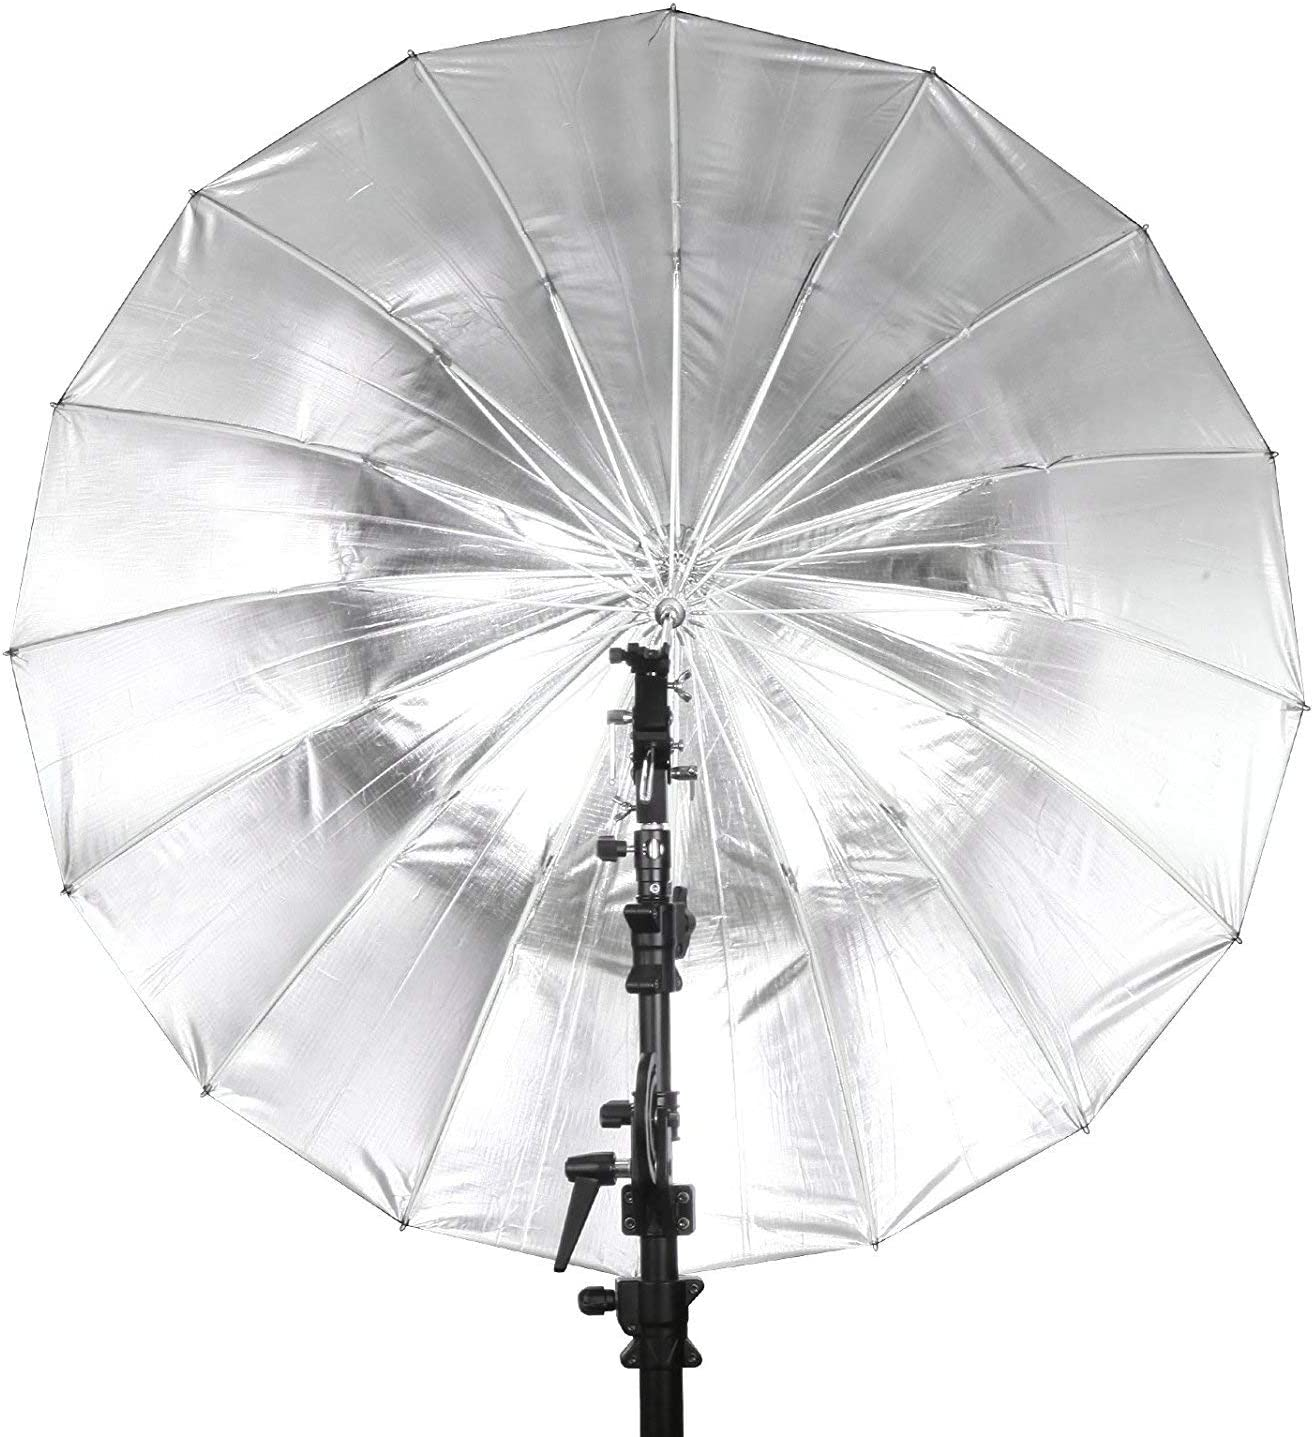 Selens Parabolic Umbrella and Diffuser Photography Lighting 41 Inch Black Silver Reflective Deep Umbrella for Photo Studio Flash Speed Light